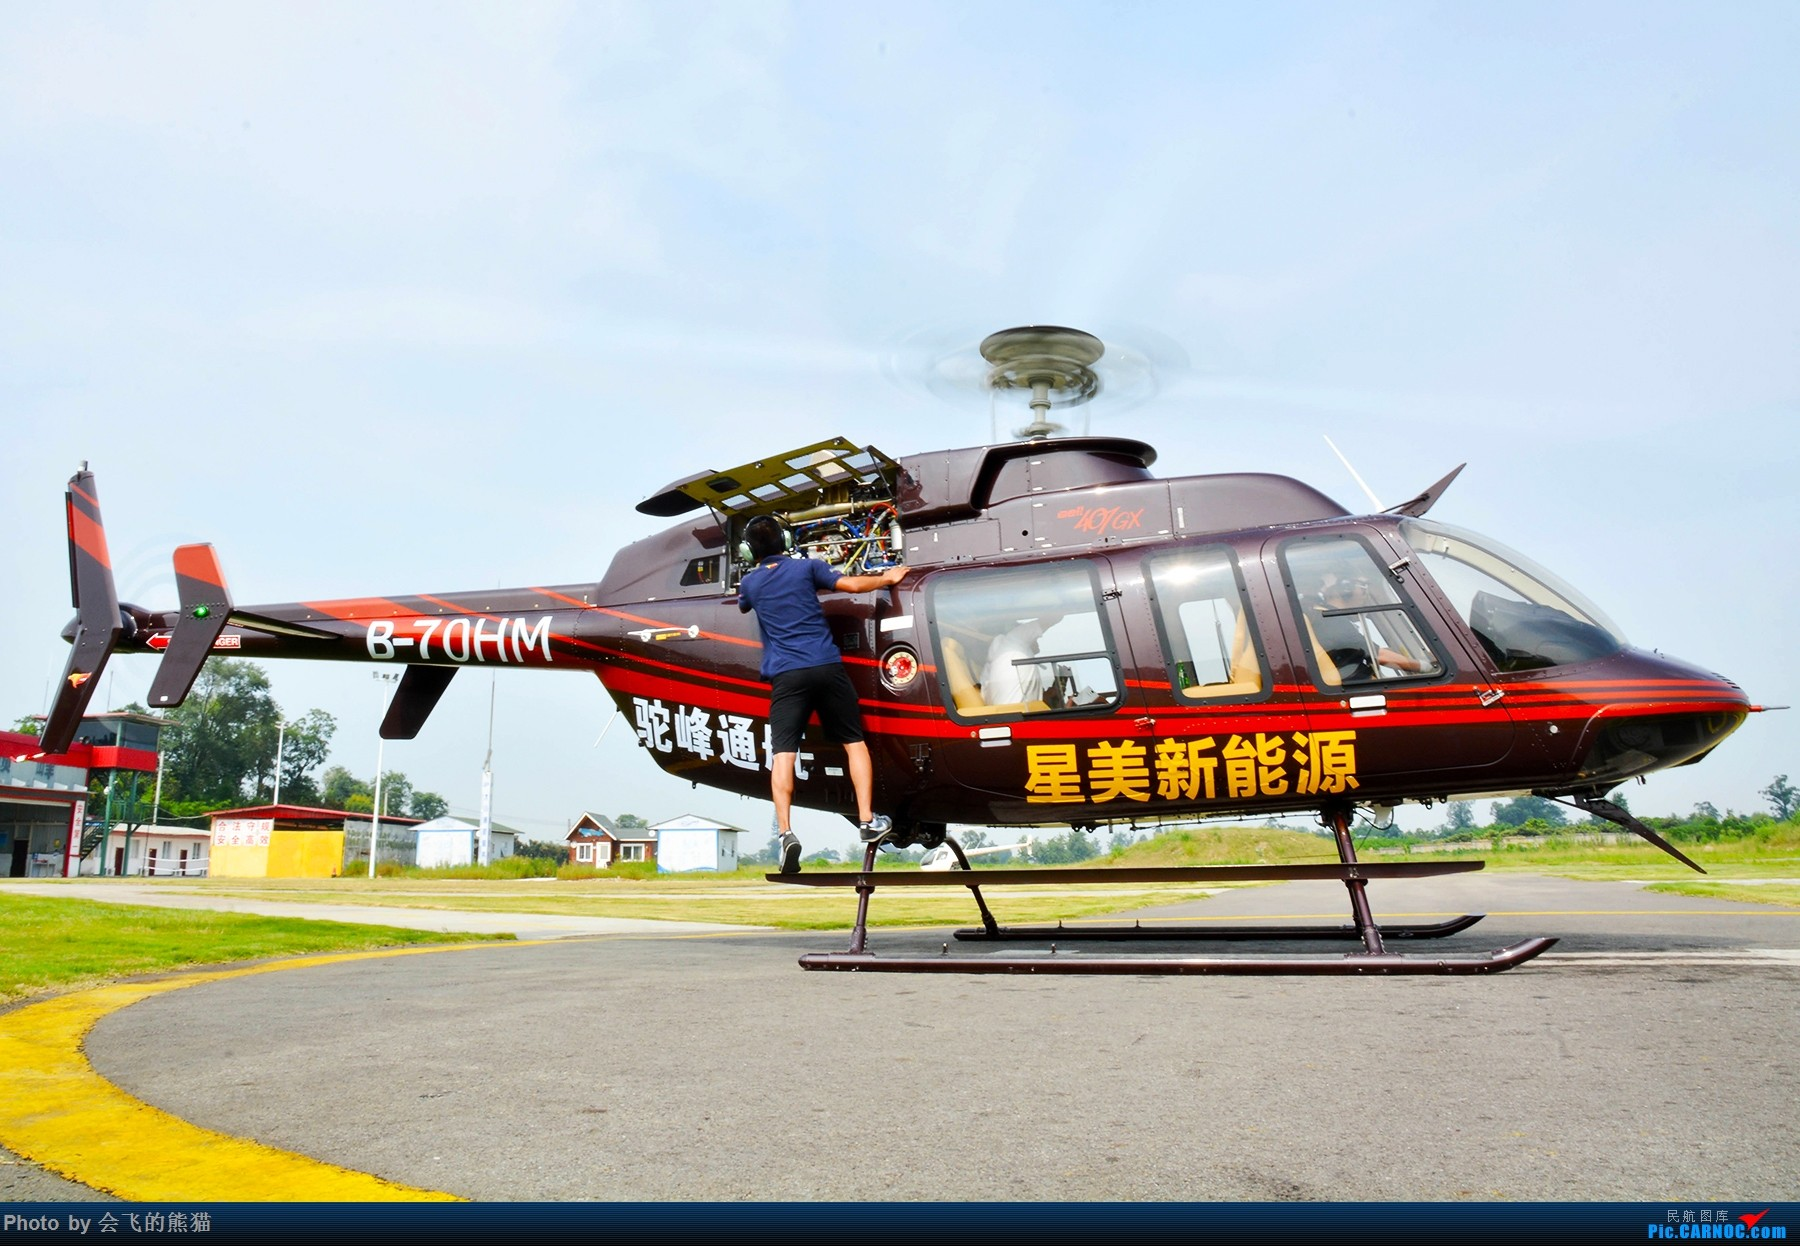 Re:[原创]十年 BELL 407GX B-70HM 驼峰洛带机场